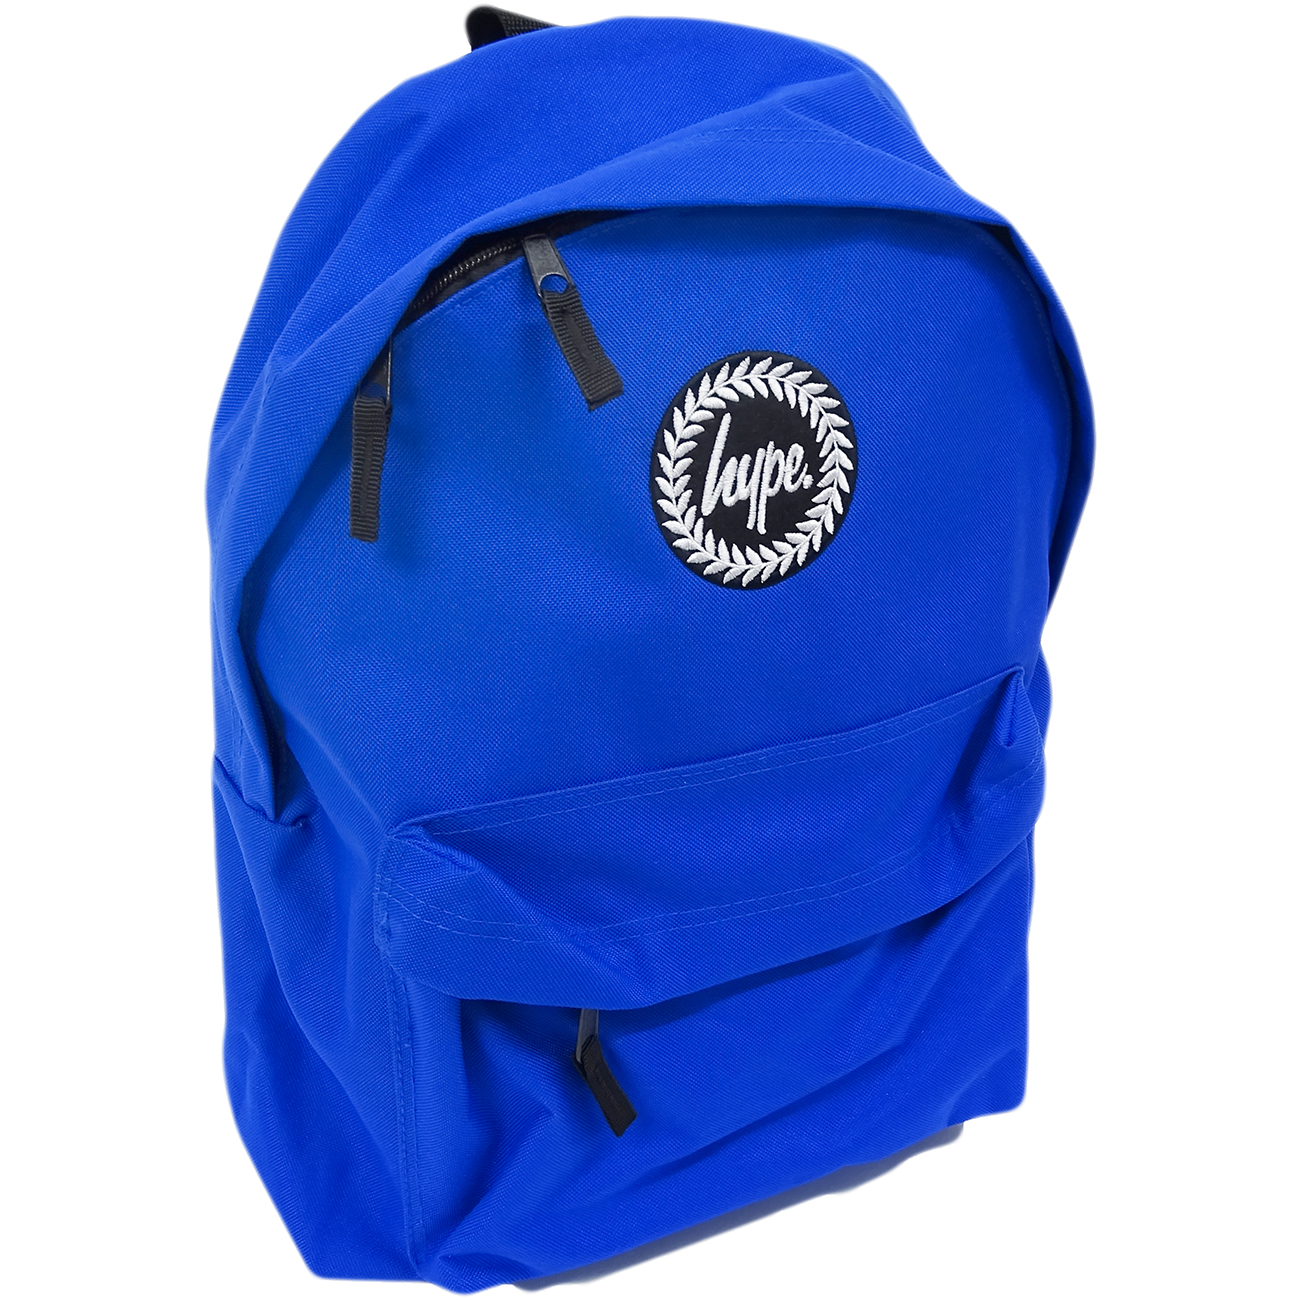 Hype Backpack Plain Royal Blue Bag